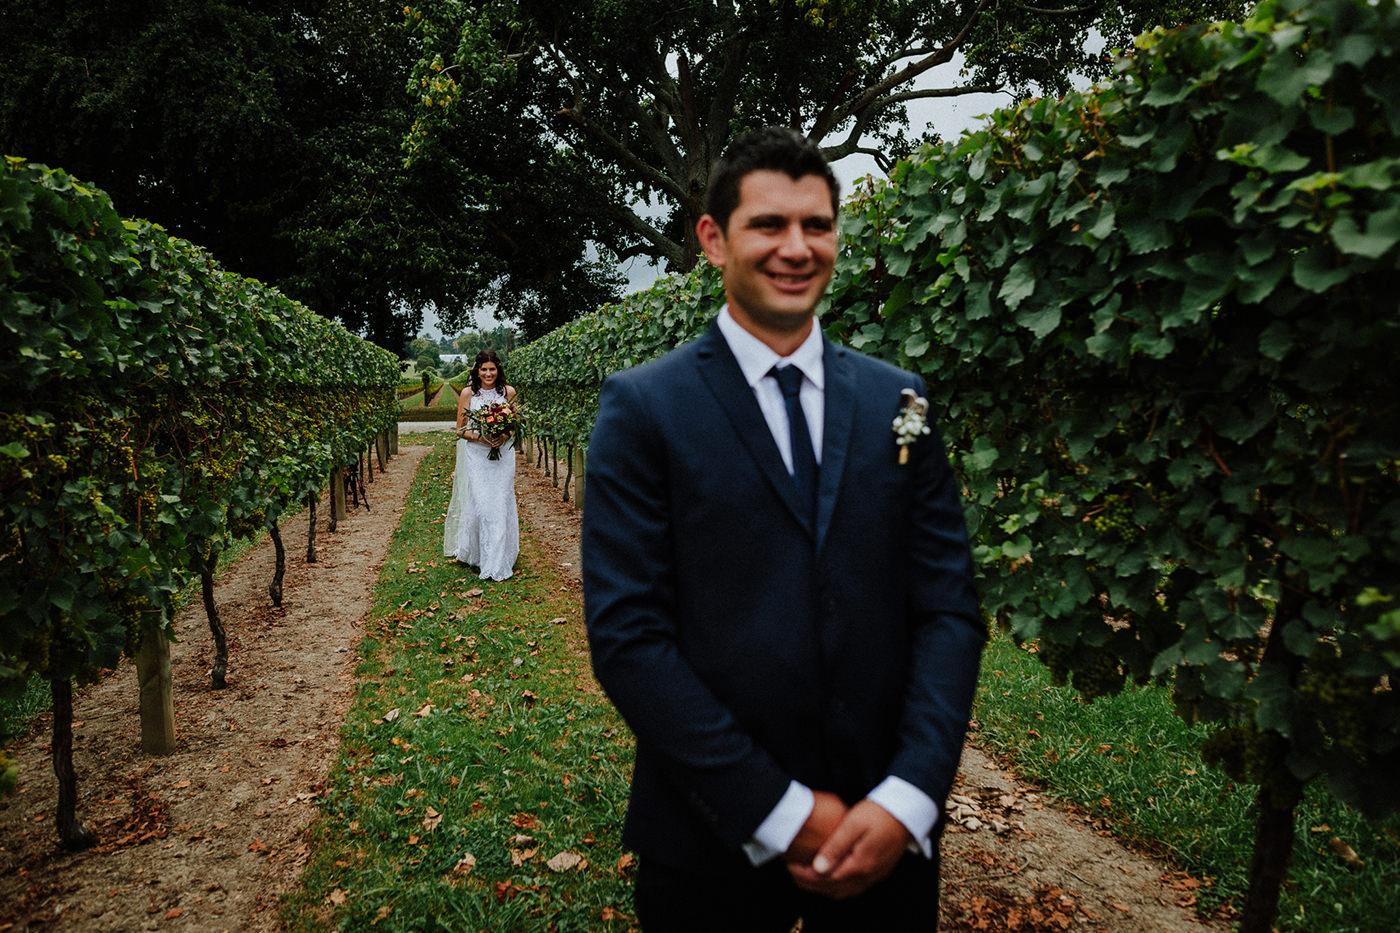 wedding_photographer_nz-00070.jpg